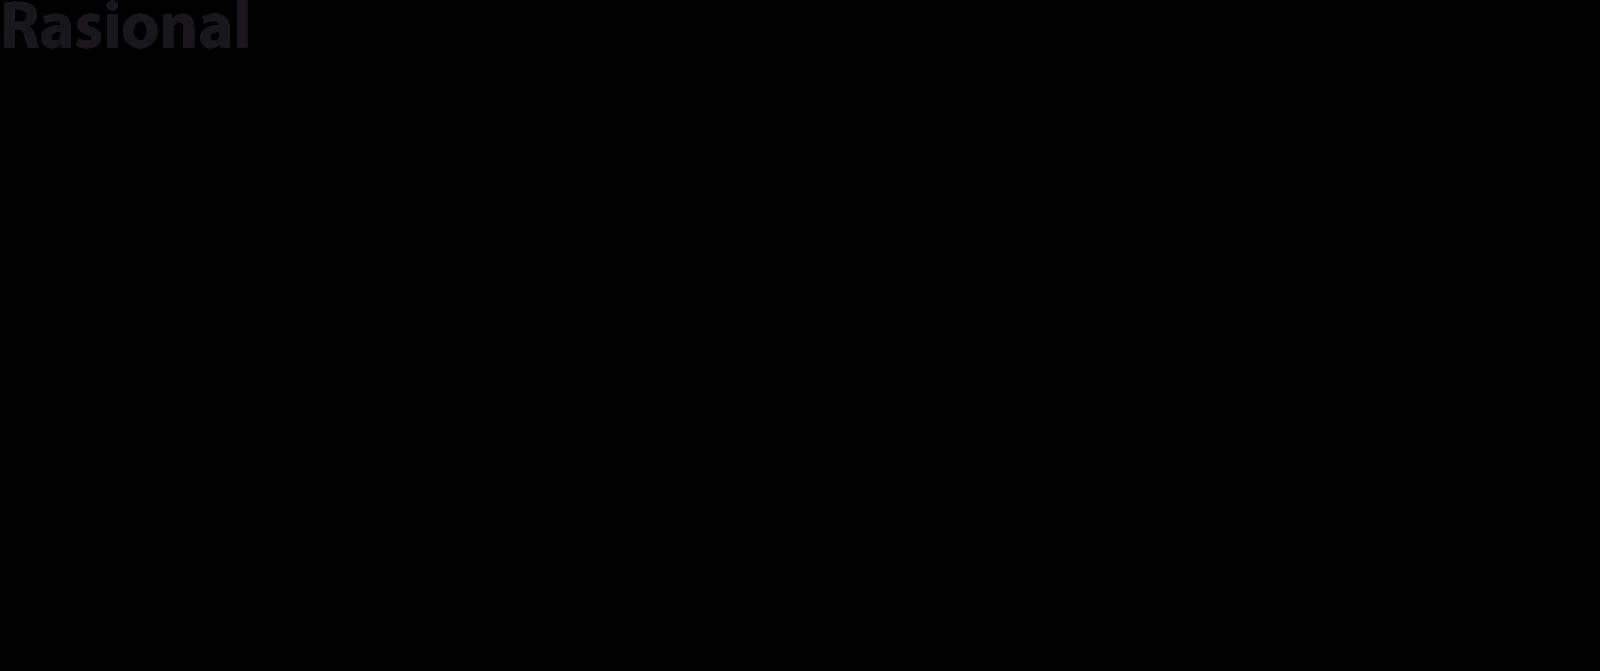 isyraq rest house logo kementerian pendidikan malaysia